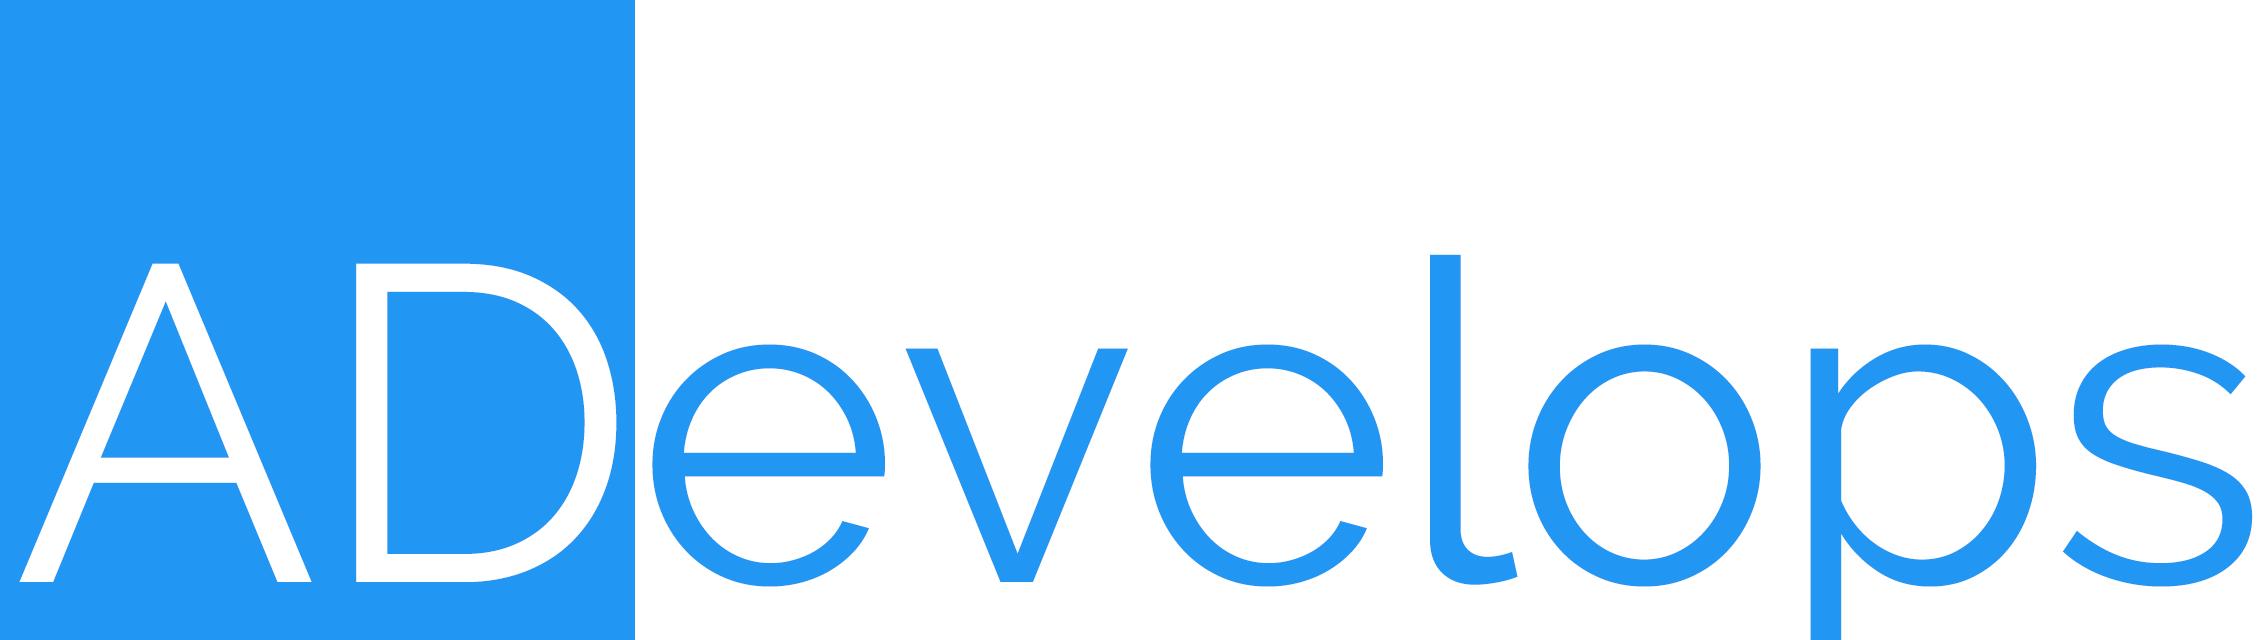 ADevelops - Get in touch with Anton Driessen